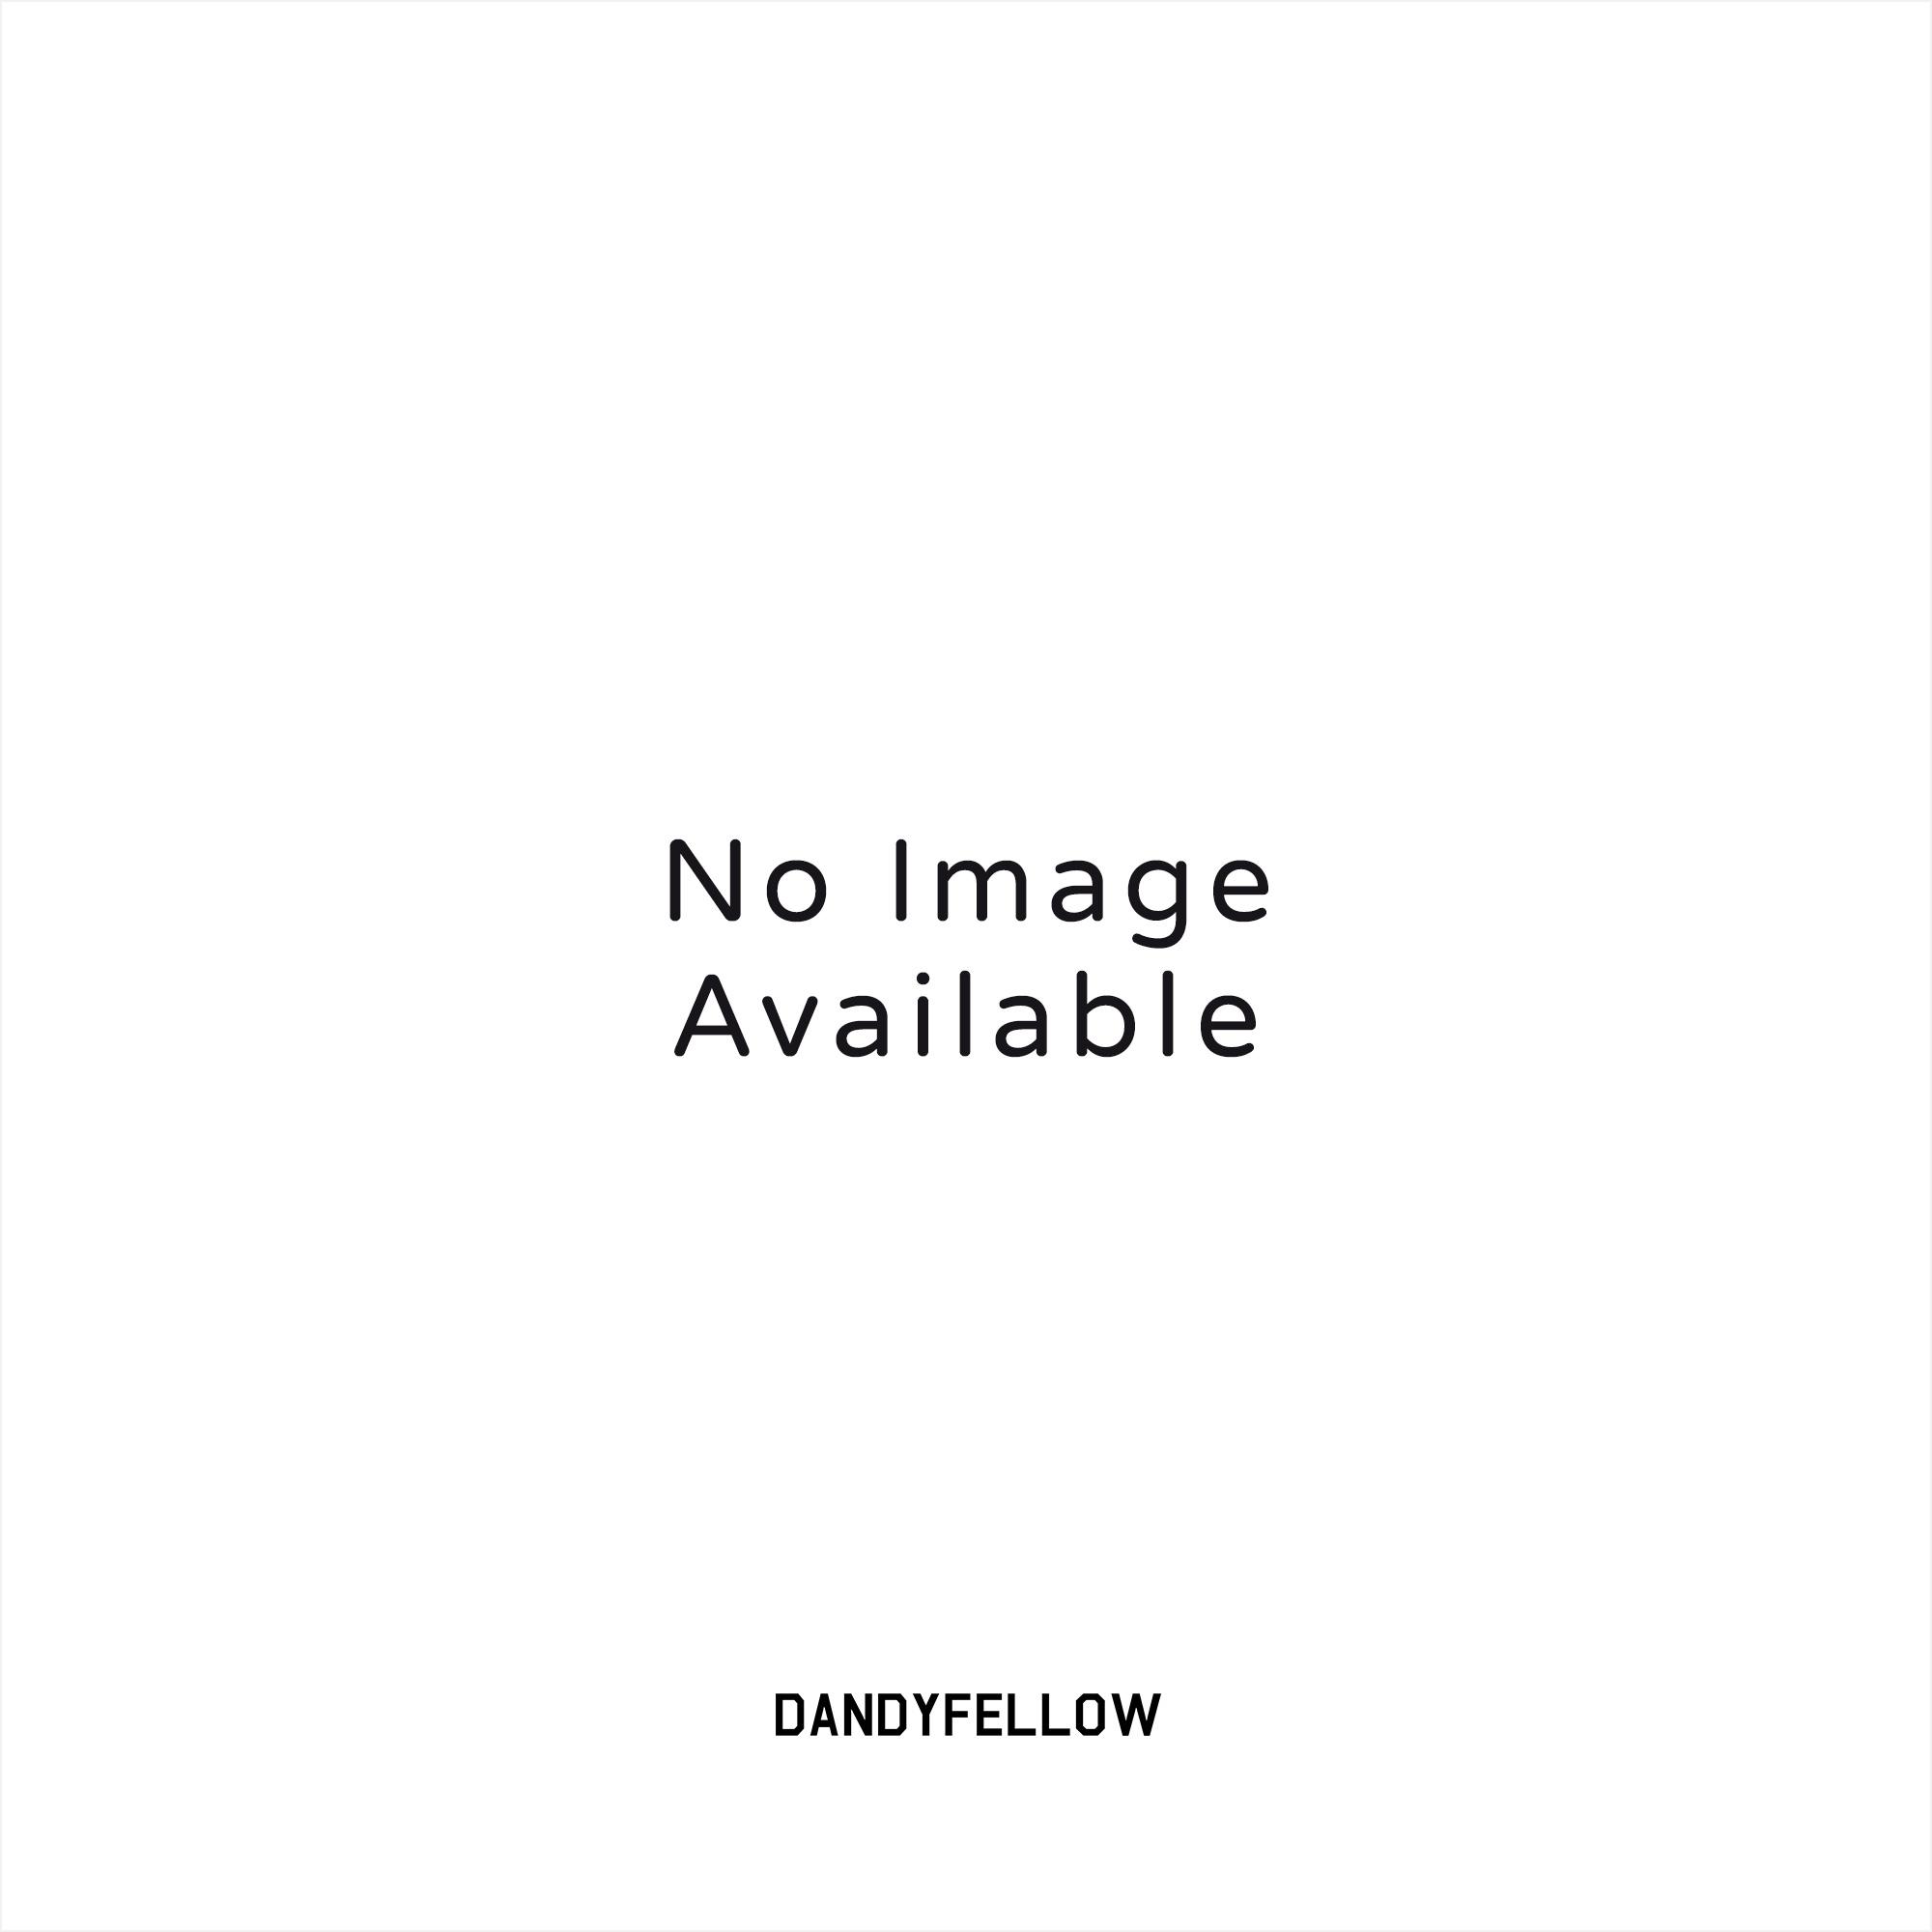 Paul Smith Osmo White Leather Shoe SRDX-S285-MLUX